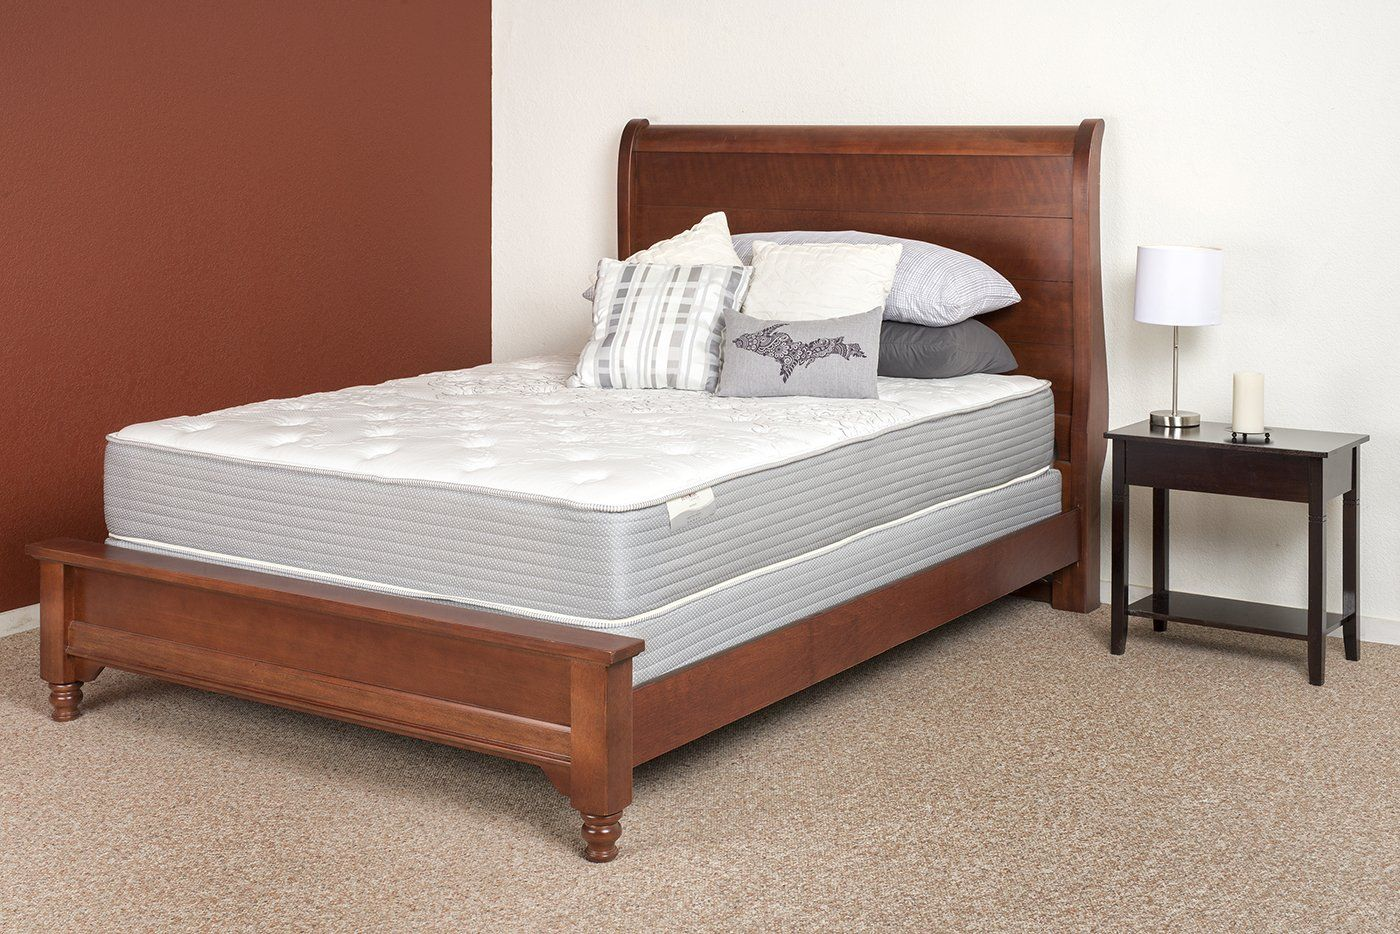 twin restonic comfort care select amherst plush mattress read more